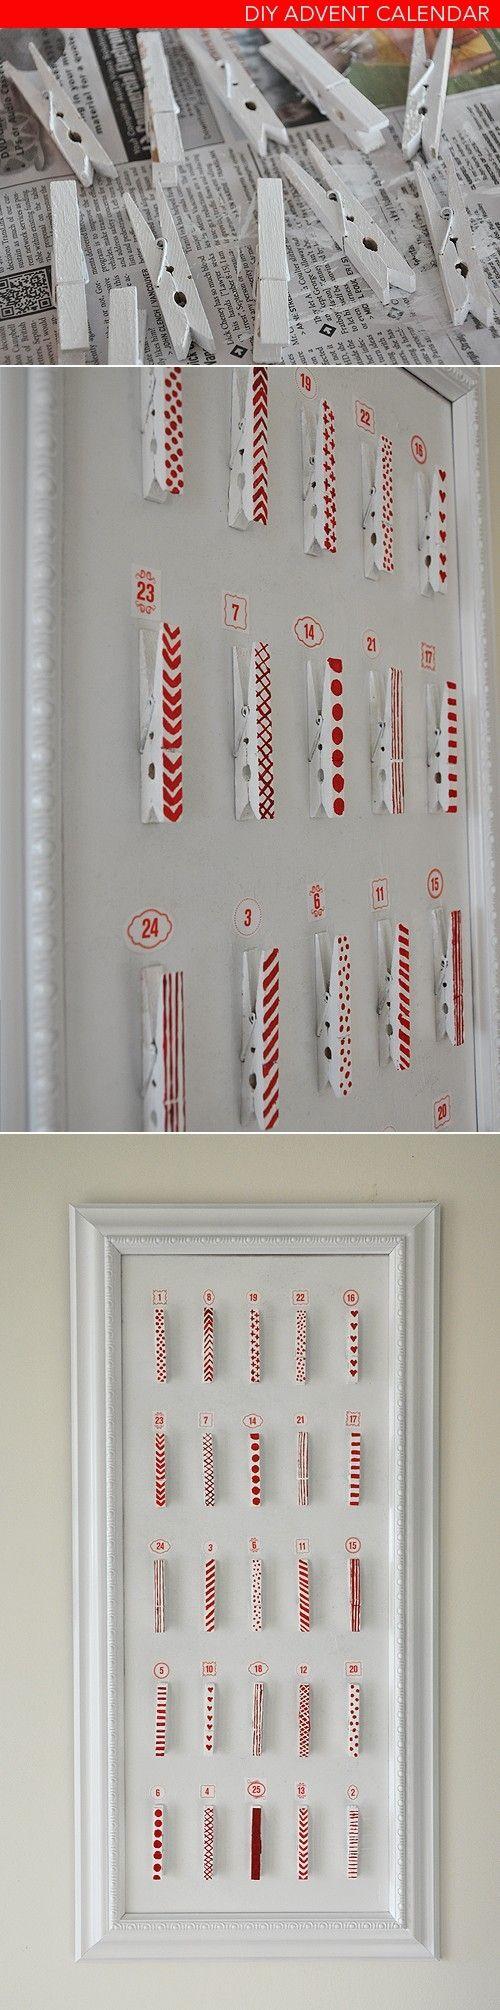 Christmas Craft Project: Advent Calendar by hefina